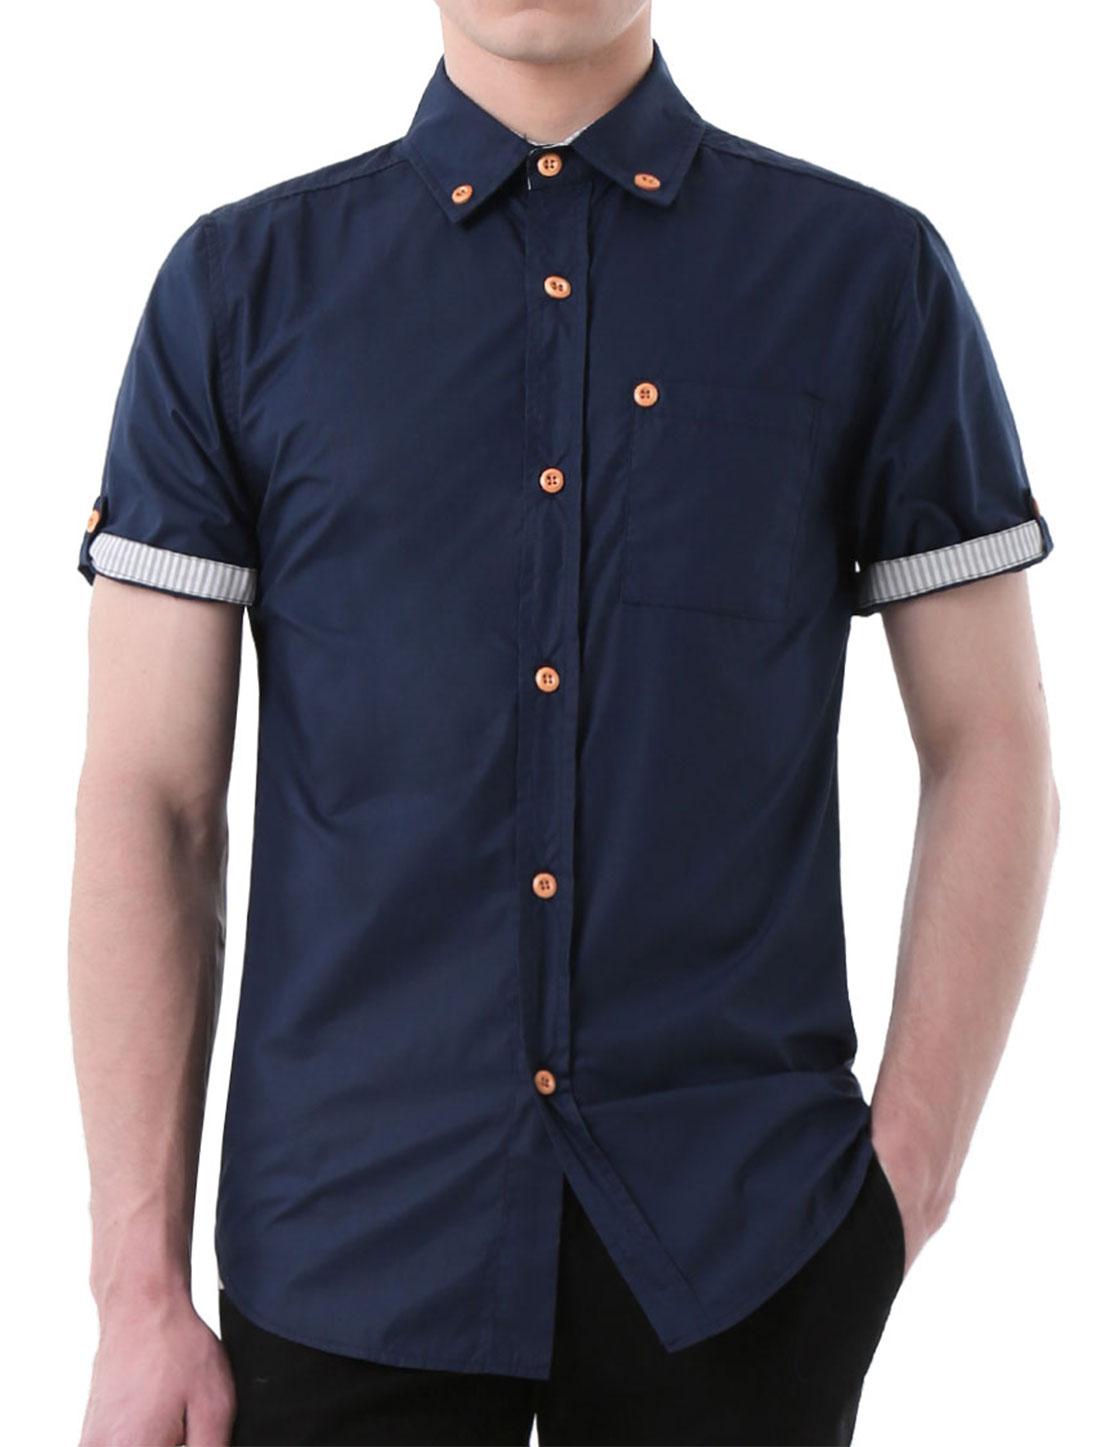 Men Short Sleeves Slim Fit Button Down Shirt w Pocket Navy Blue M